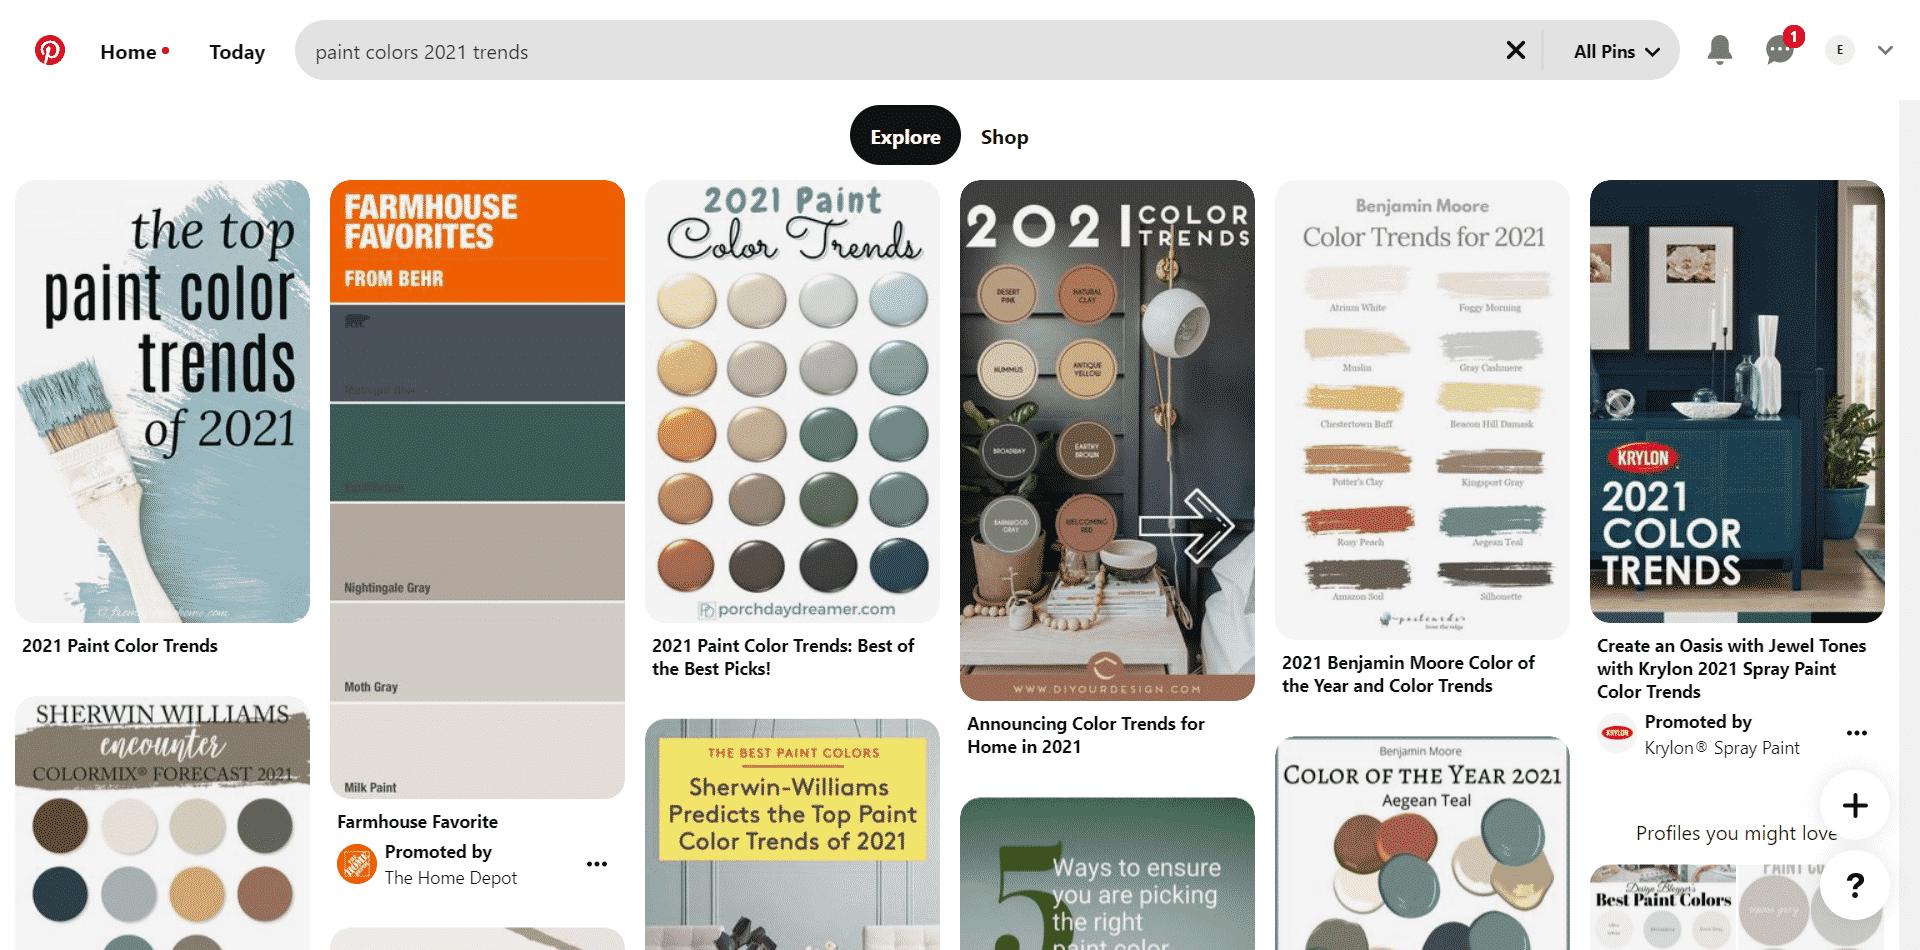 DIY Tips from Pinterest